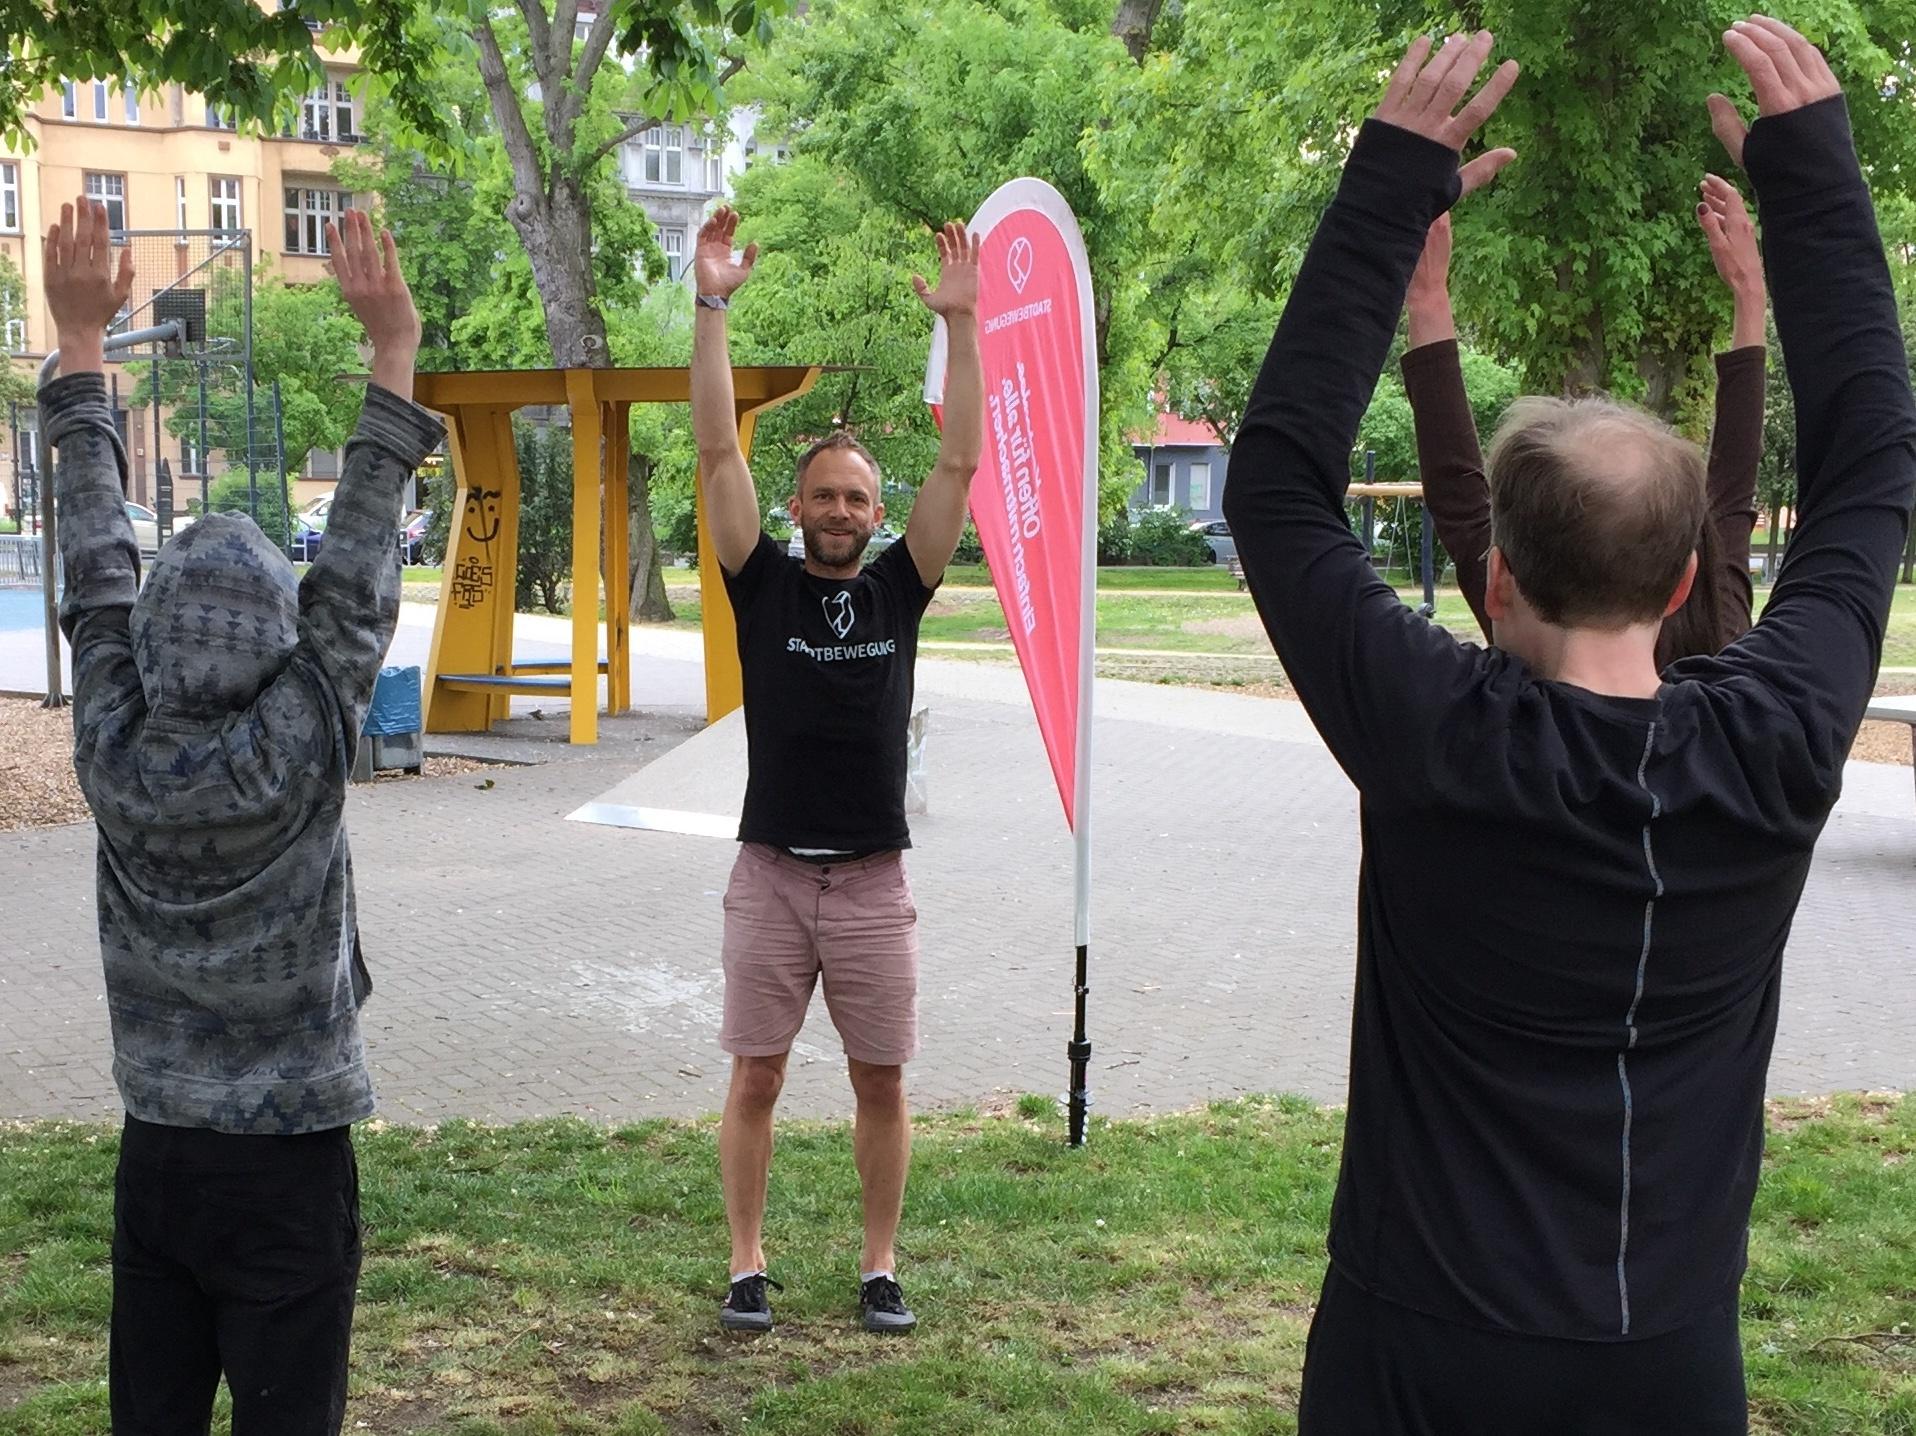 Stadtbewegung Menschen beim Sport im Park Neukölln